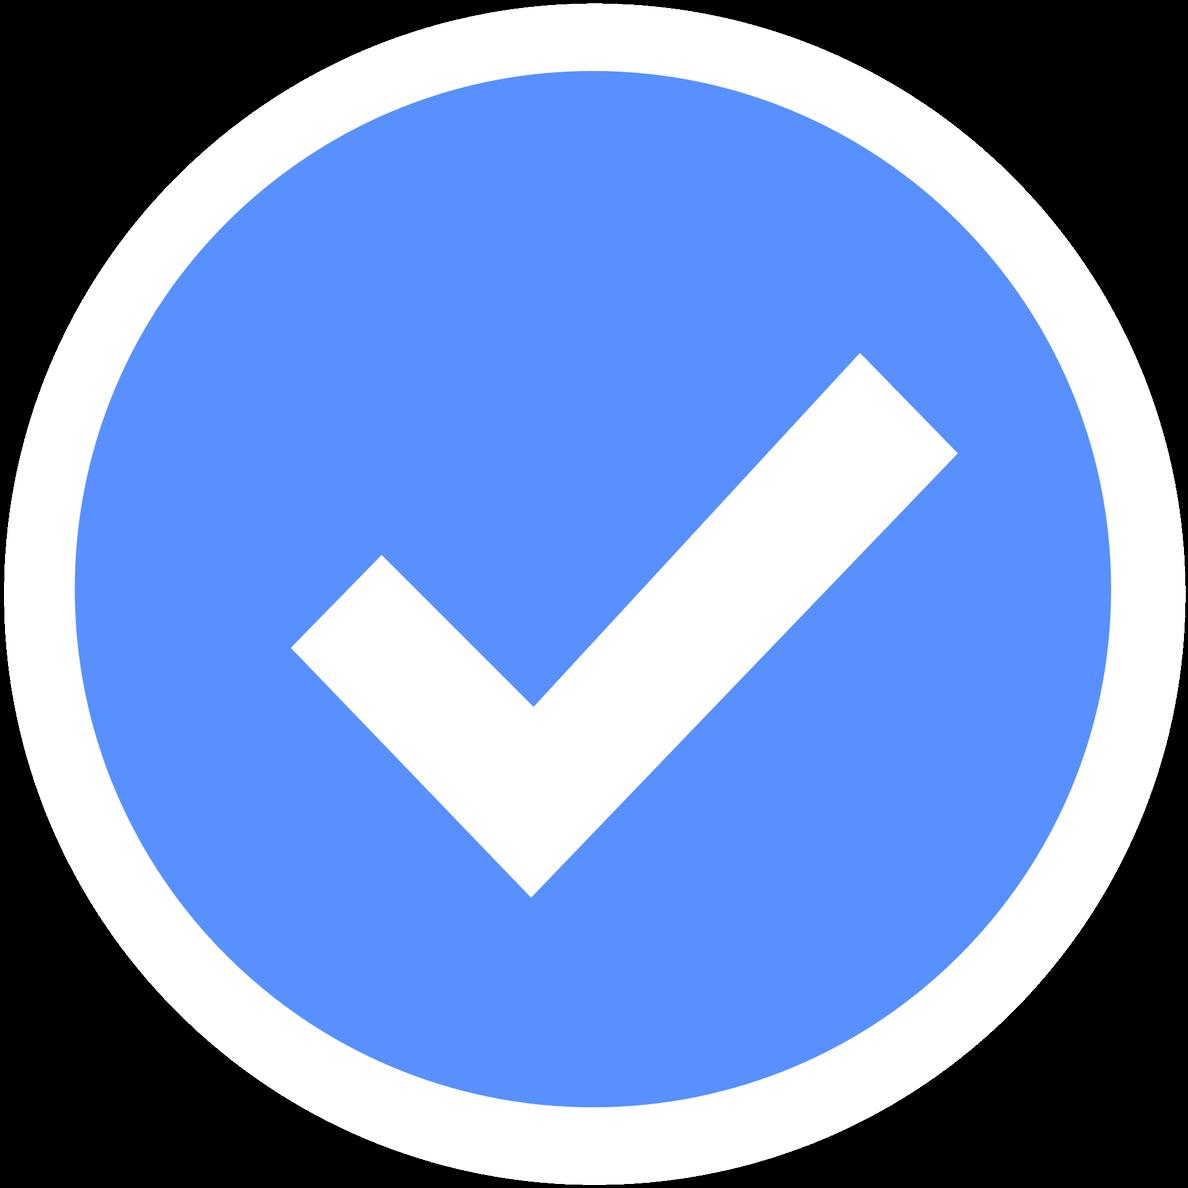 twitter logo png transparent background - Julia Bayer On Twitter - Facebook  Blue Tick Png | #413660 - Vippng